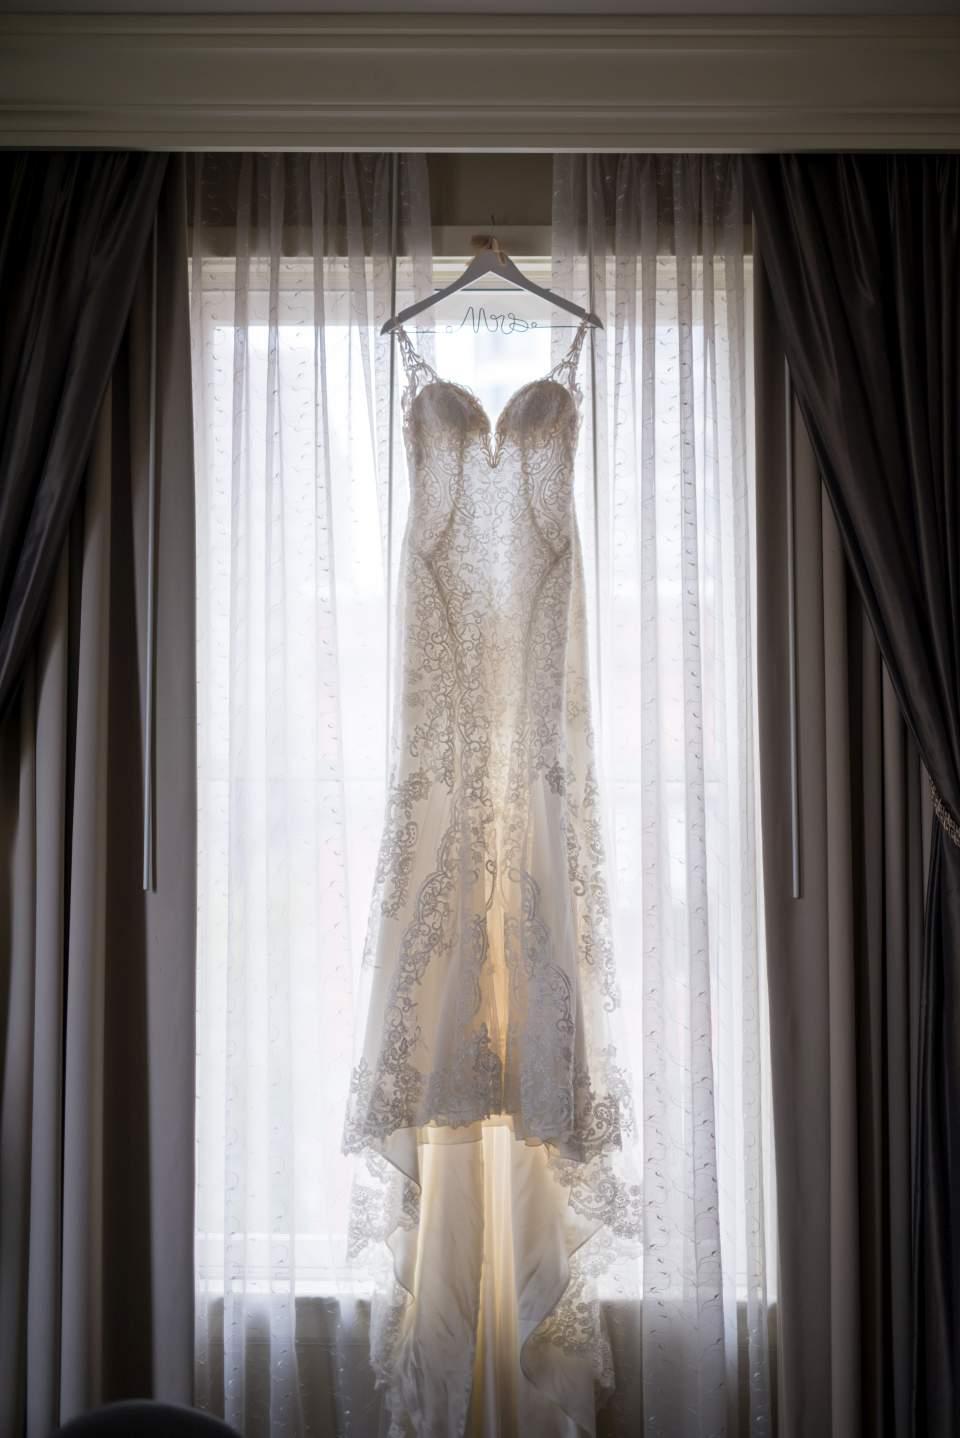 lace wedding dress hanging in window